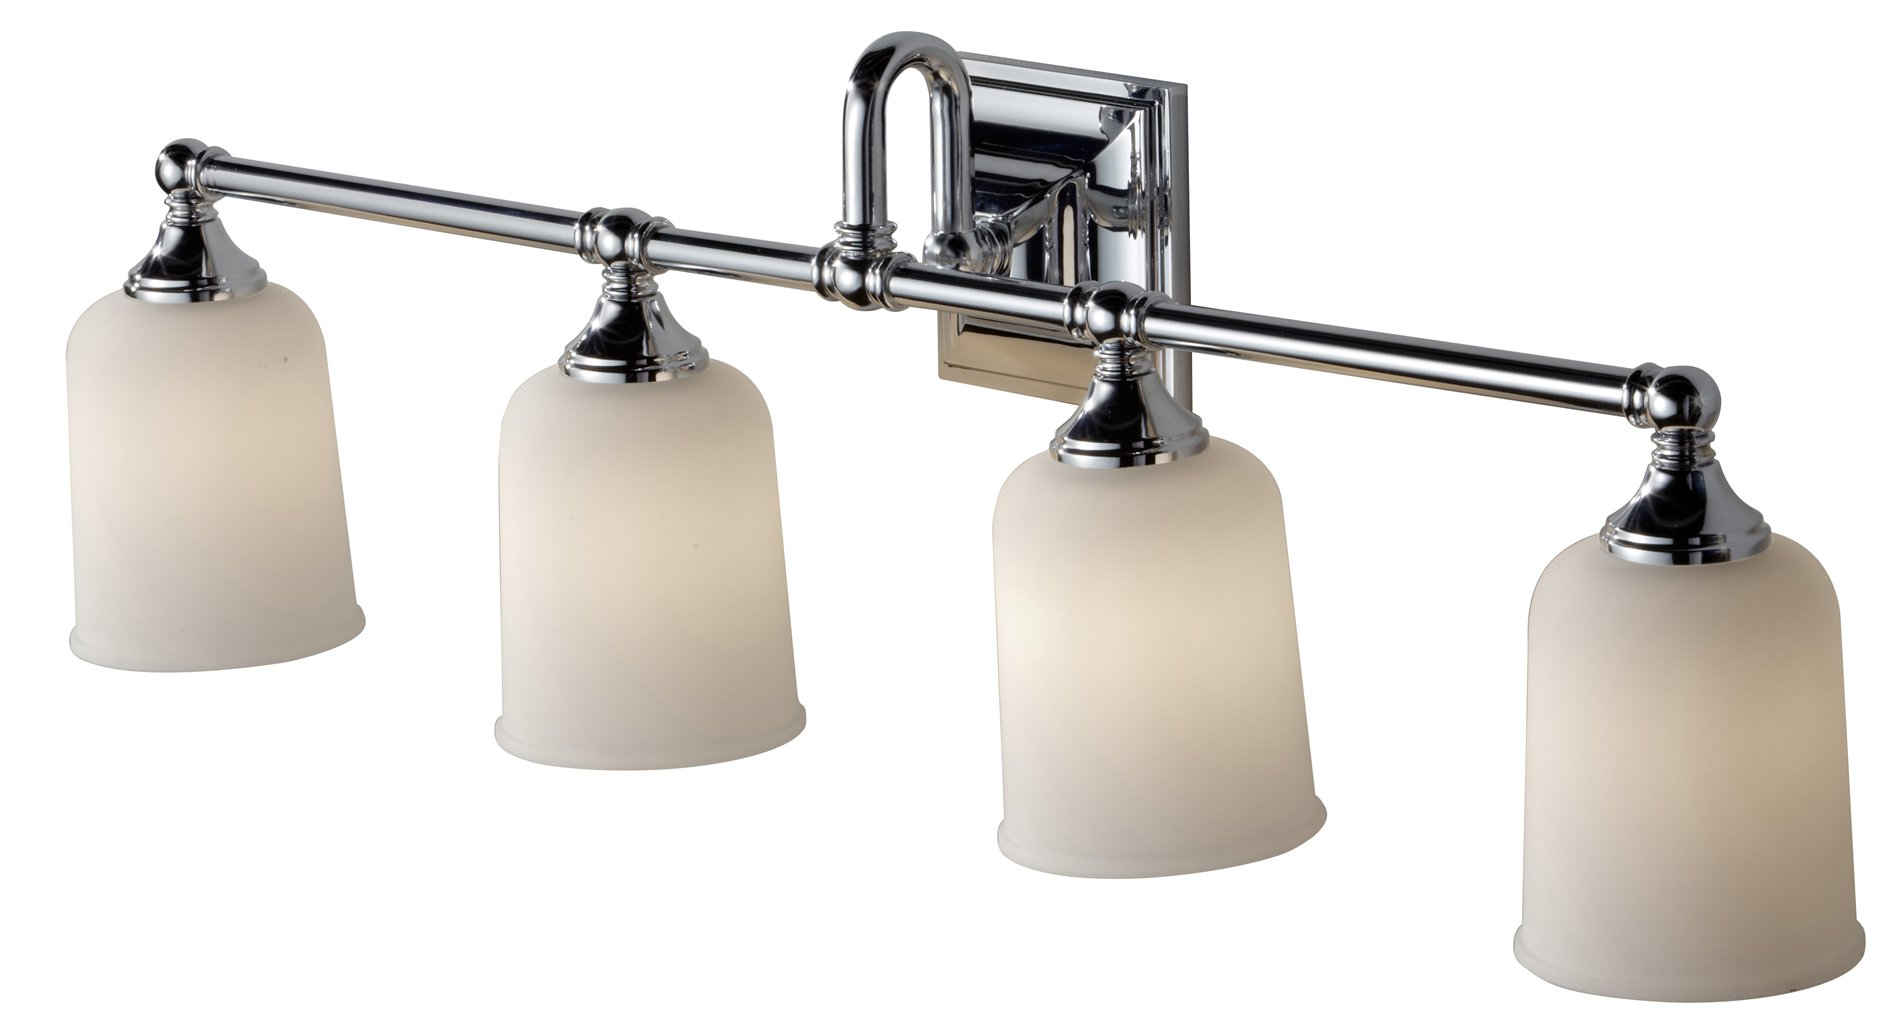 Murray feiss vs27004 ch harvard transitional bathroom for Murray feiss bathroom lighting fixtures